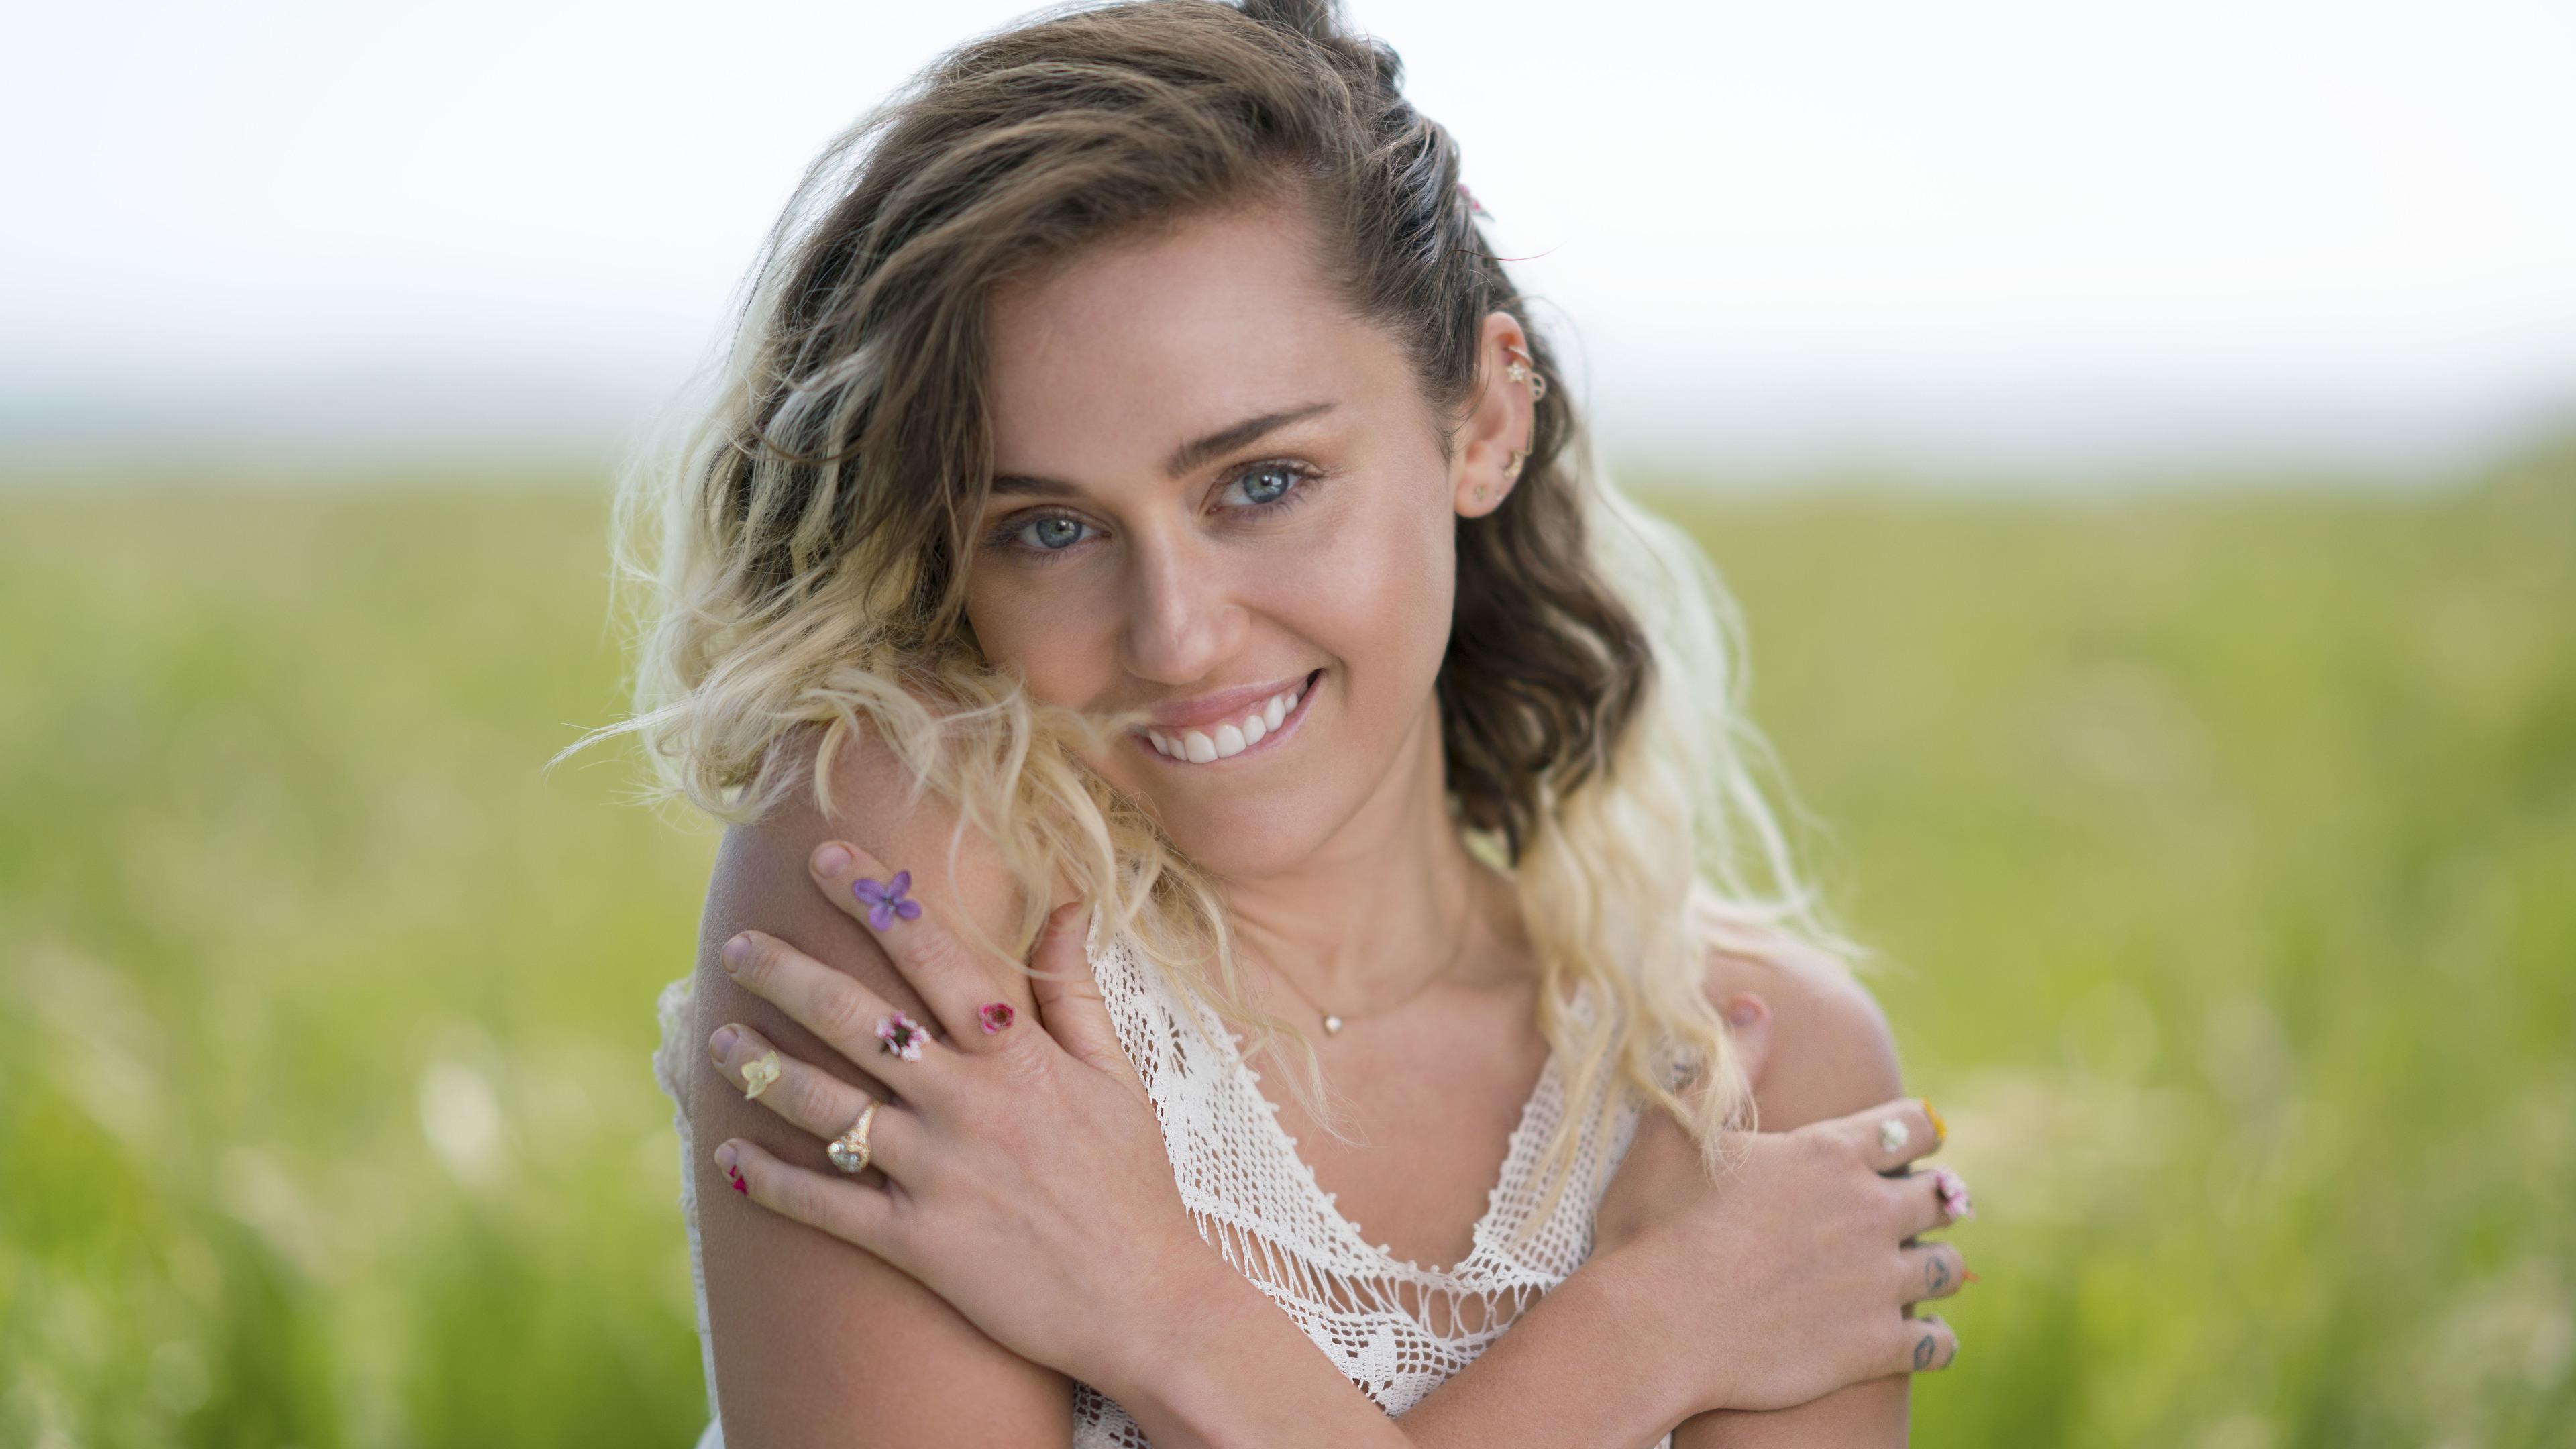 miley cyrus smiling 1536949364 - Miley Cyrus Smiling - singer wallpapers, music wallpapers, miley cyrus wallpapers, hd-wallpapers, girls wallpapers, celebrities wallpapers, 8k wallpapers, 5k wallpapers, 4k-wallpapers